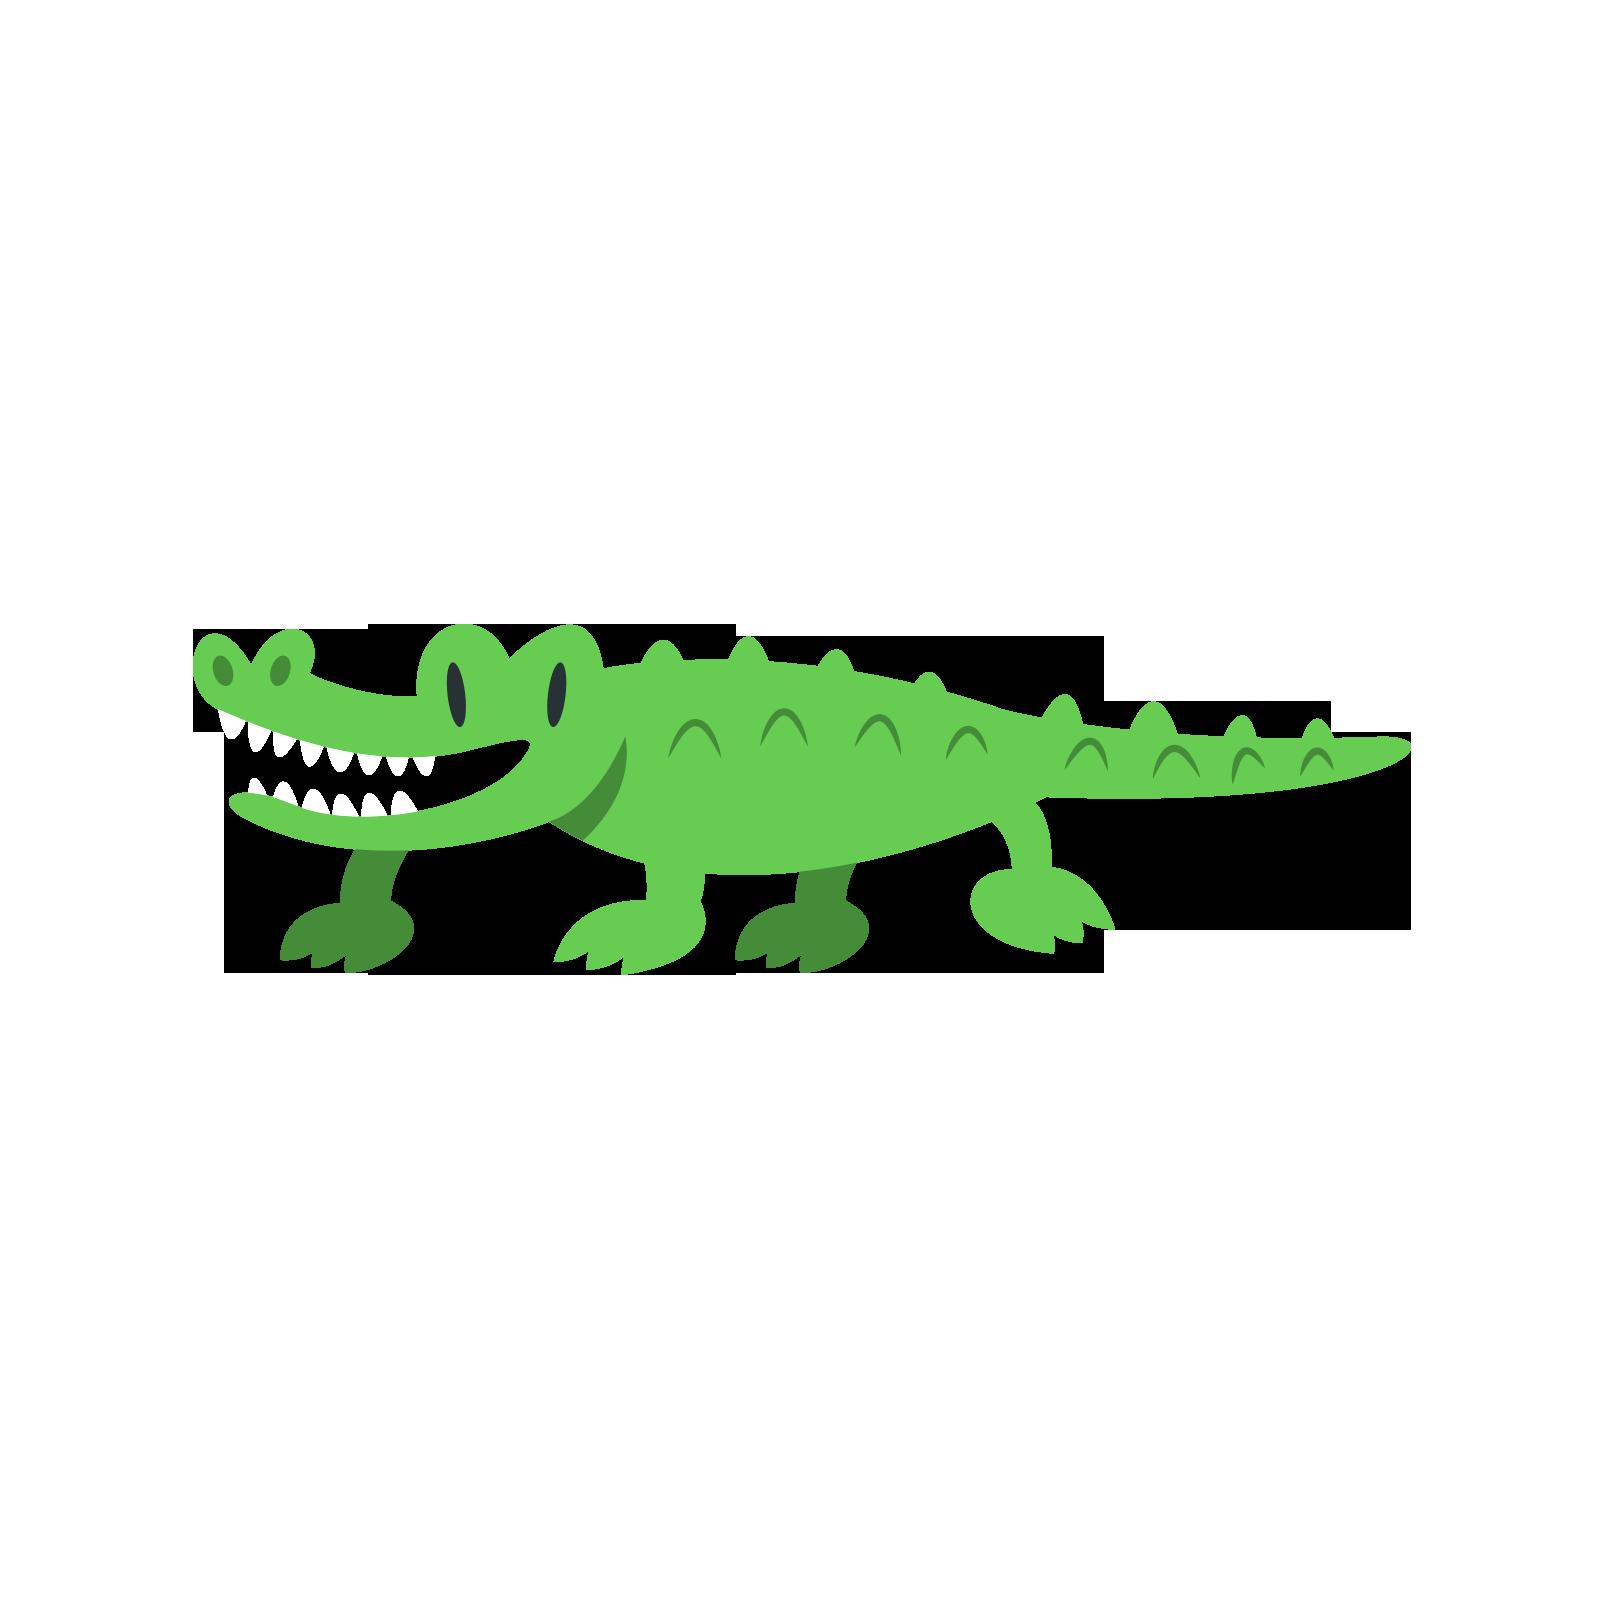 svg stock Crocodiles Cartoon Animal Clip art